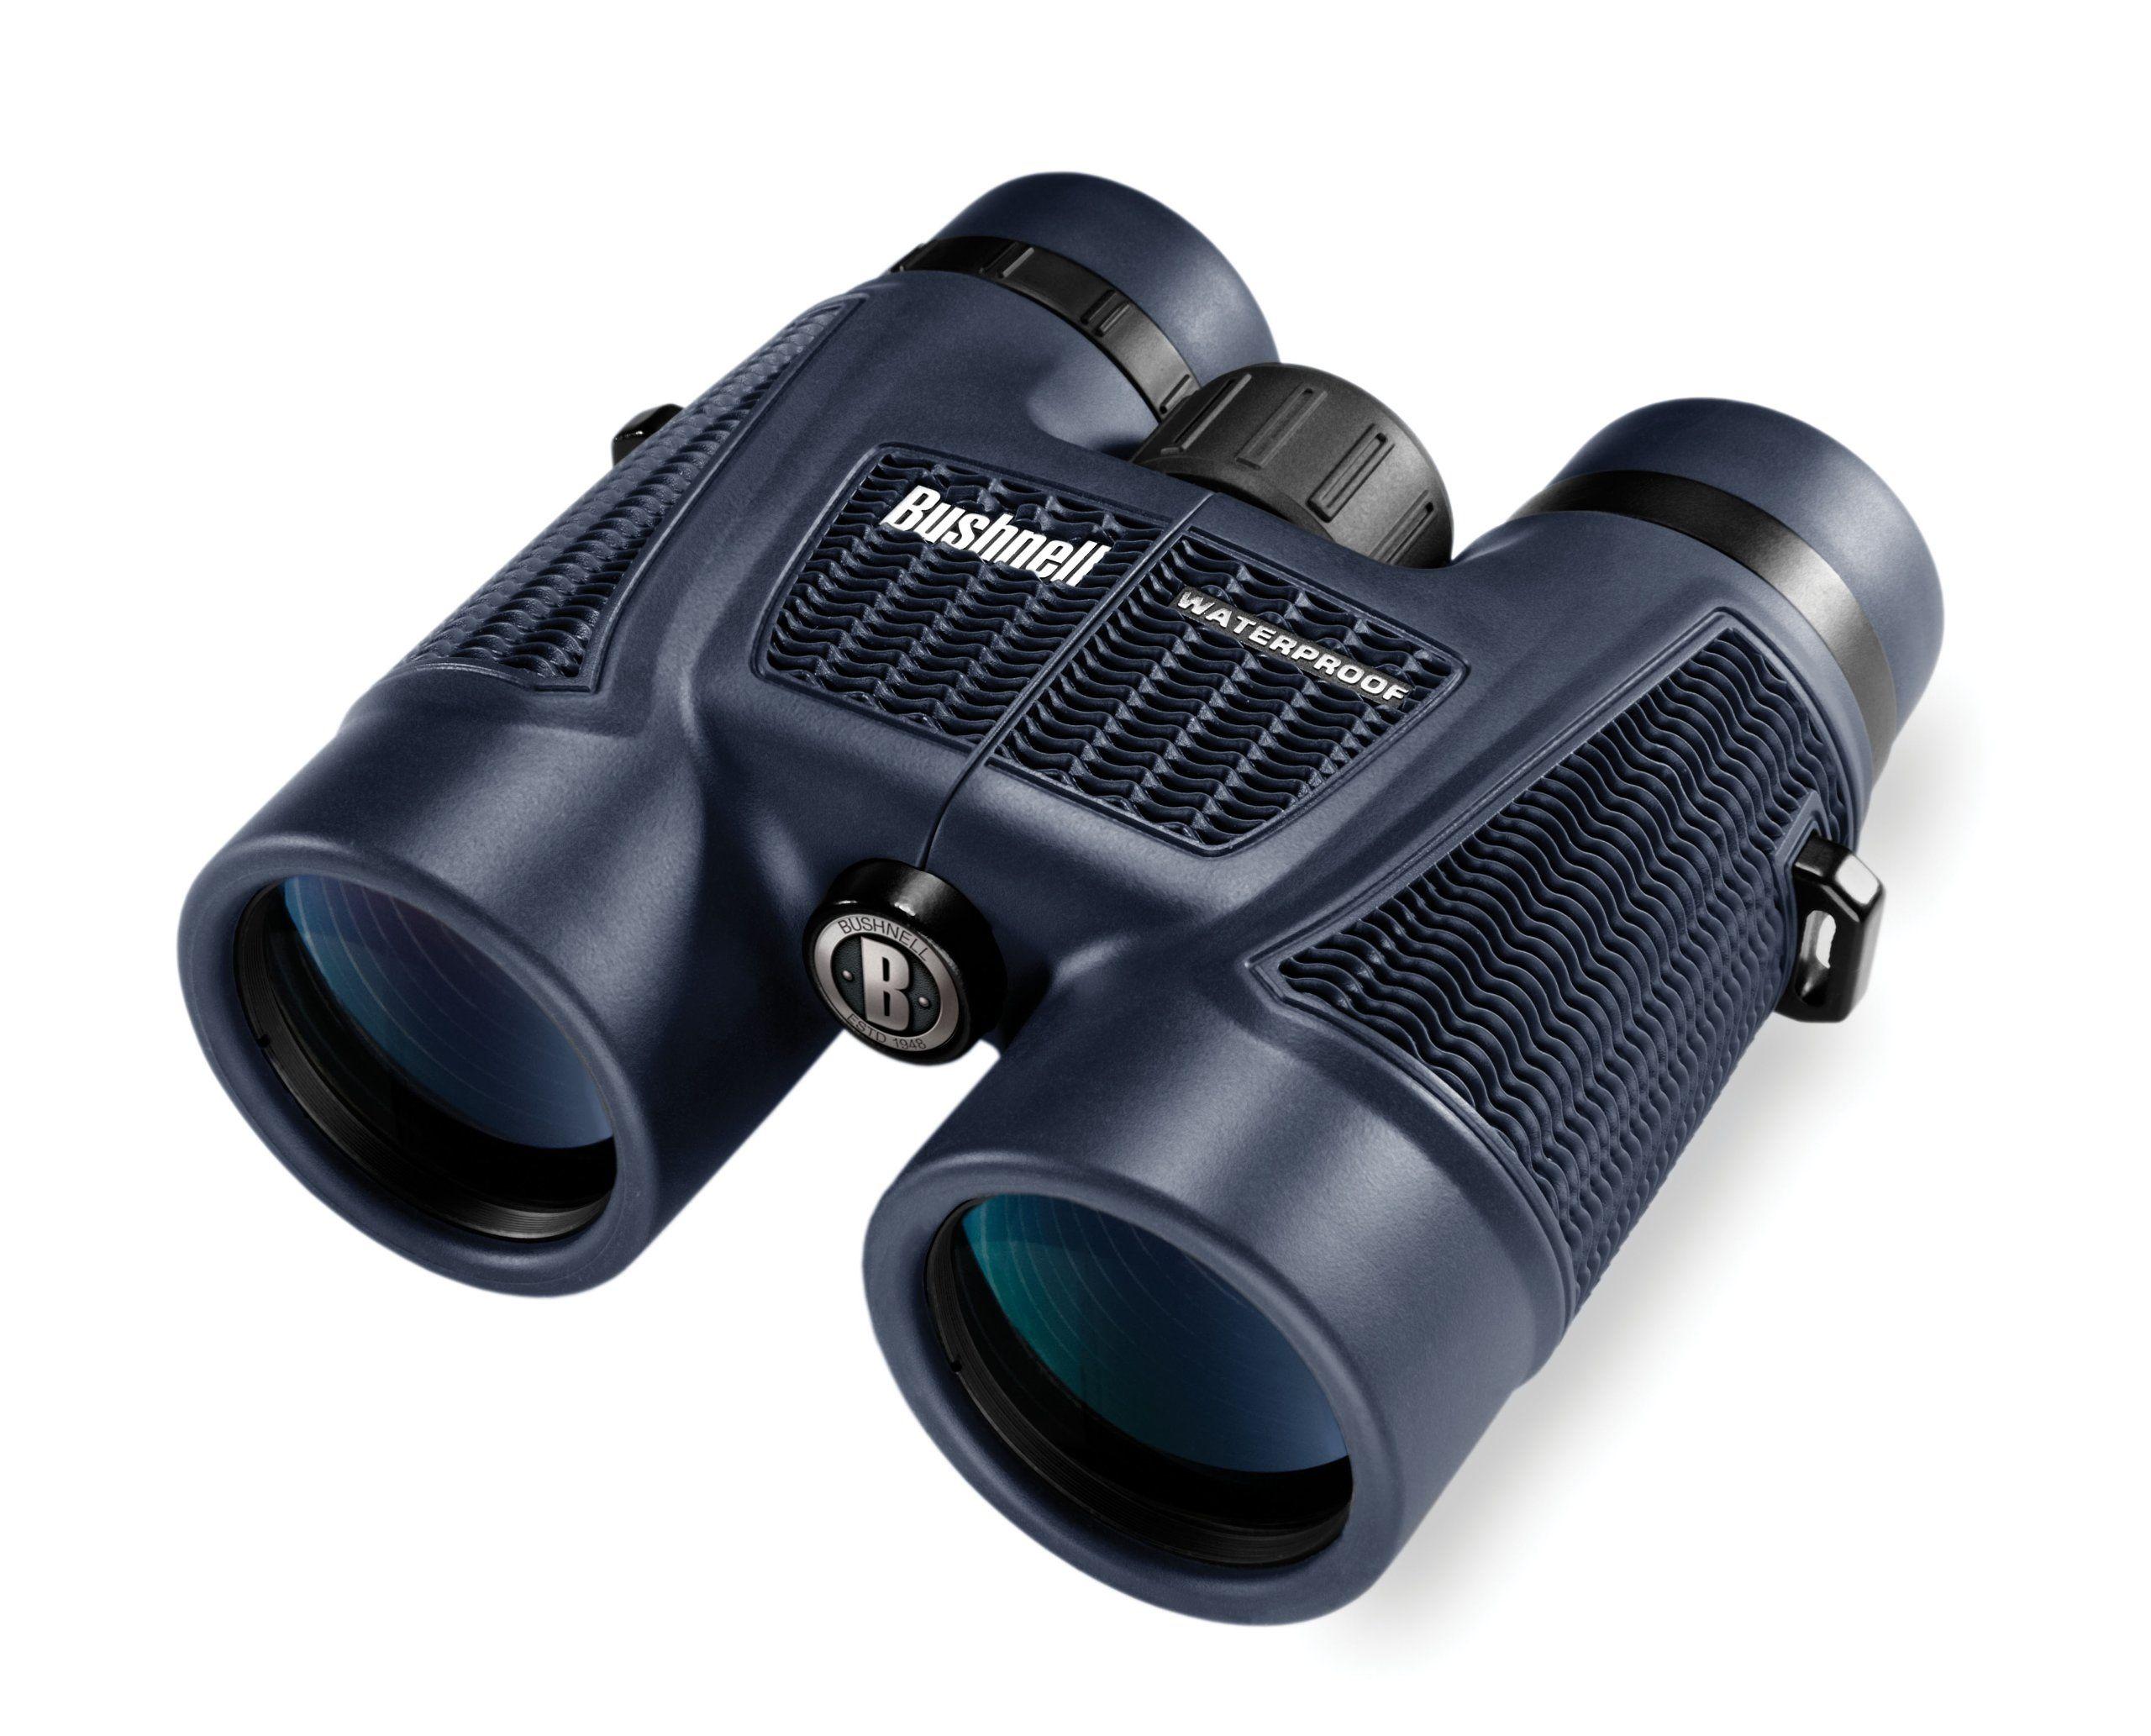 Bushnell H2o Waterproof Fogproof Roof Prism Binocular 10 X 42 Mm Black Camp Bushnell Binoculars Binoculars Y Telescope